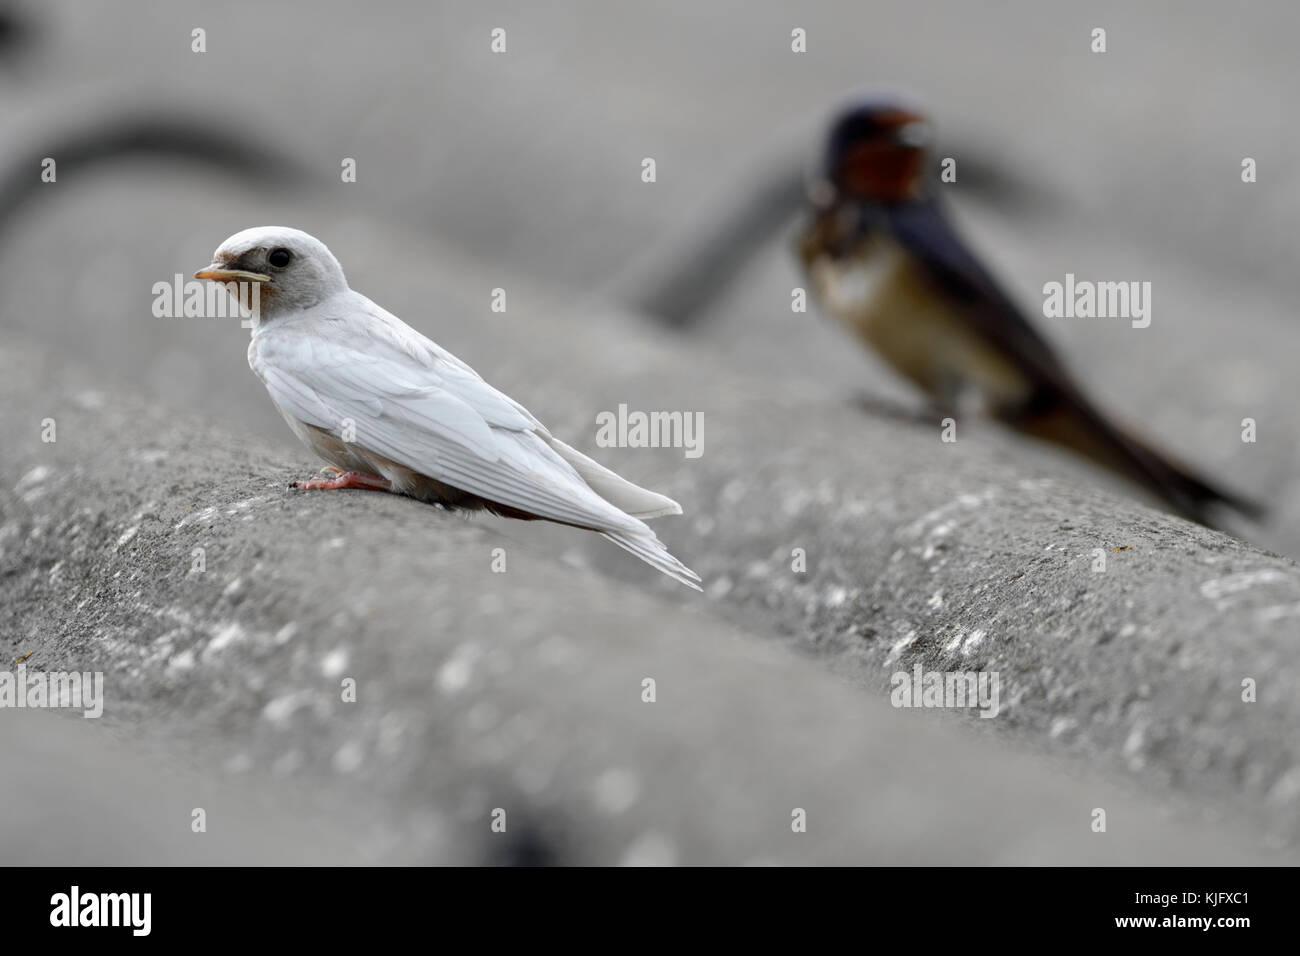 Barn Swallow ( Hirundo rustica ), fledged, gene mutation, white plumage, leucistic, leucism, perched together with - Stock Image